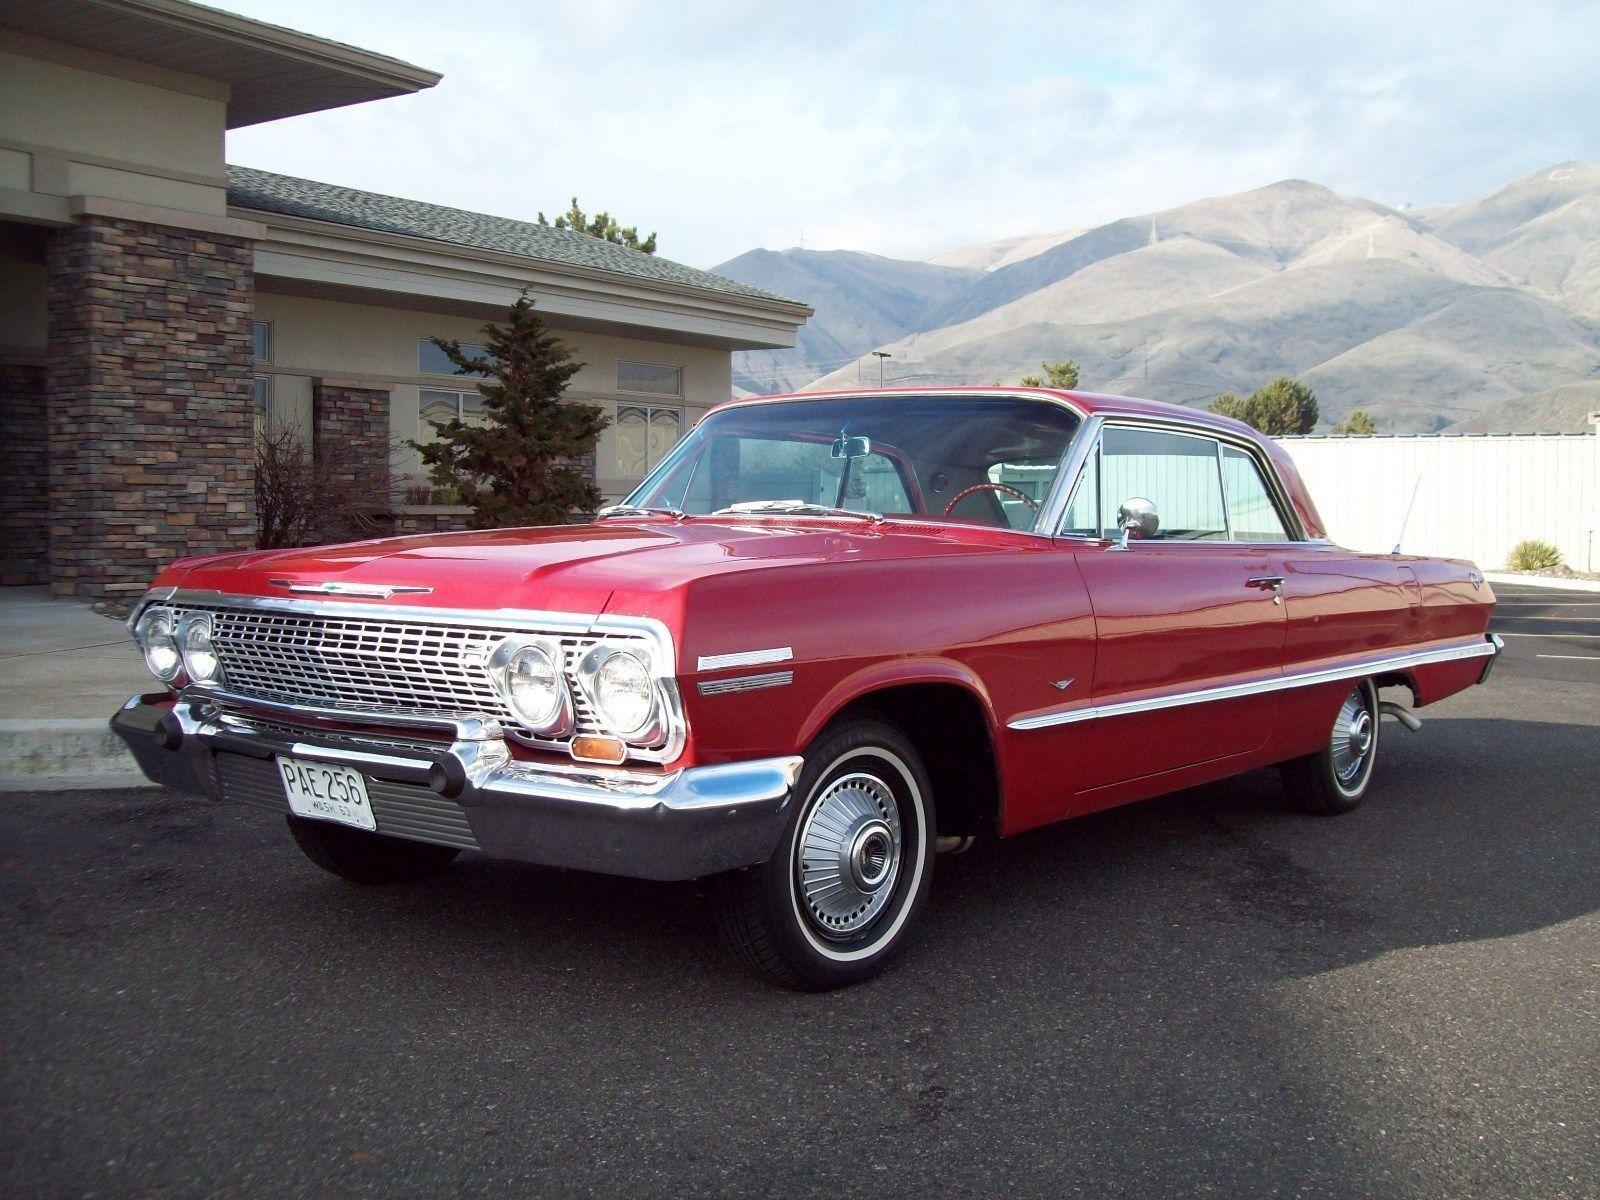 1963 Chevrolet Impala 2 Door Hardtop Chevroletimpala1963 Chevrolet Impala Chevrolet Classic Cars Chevy